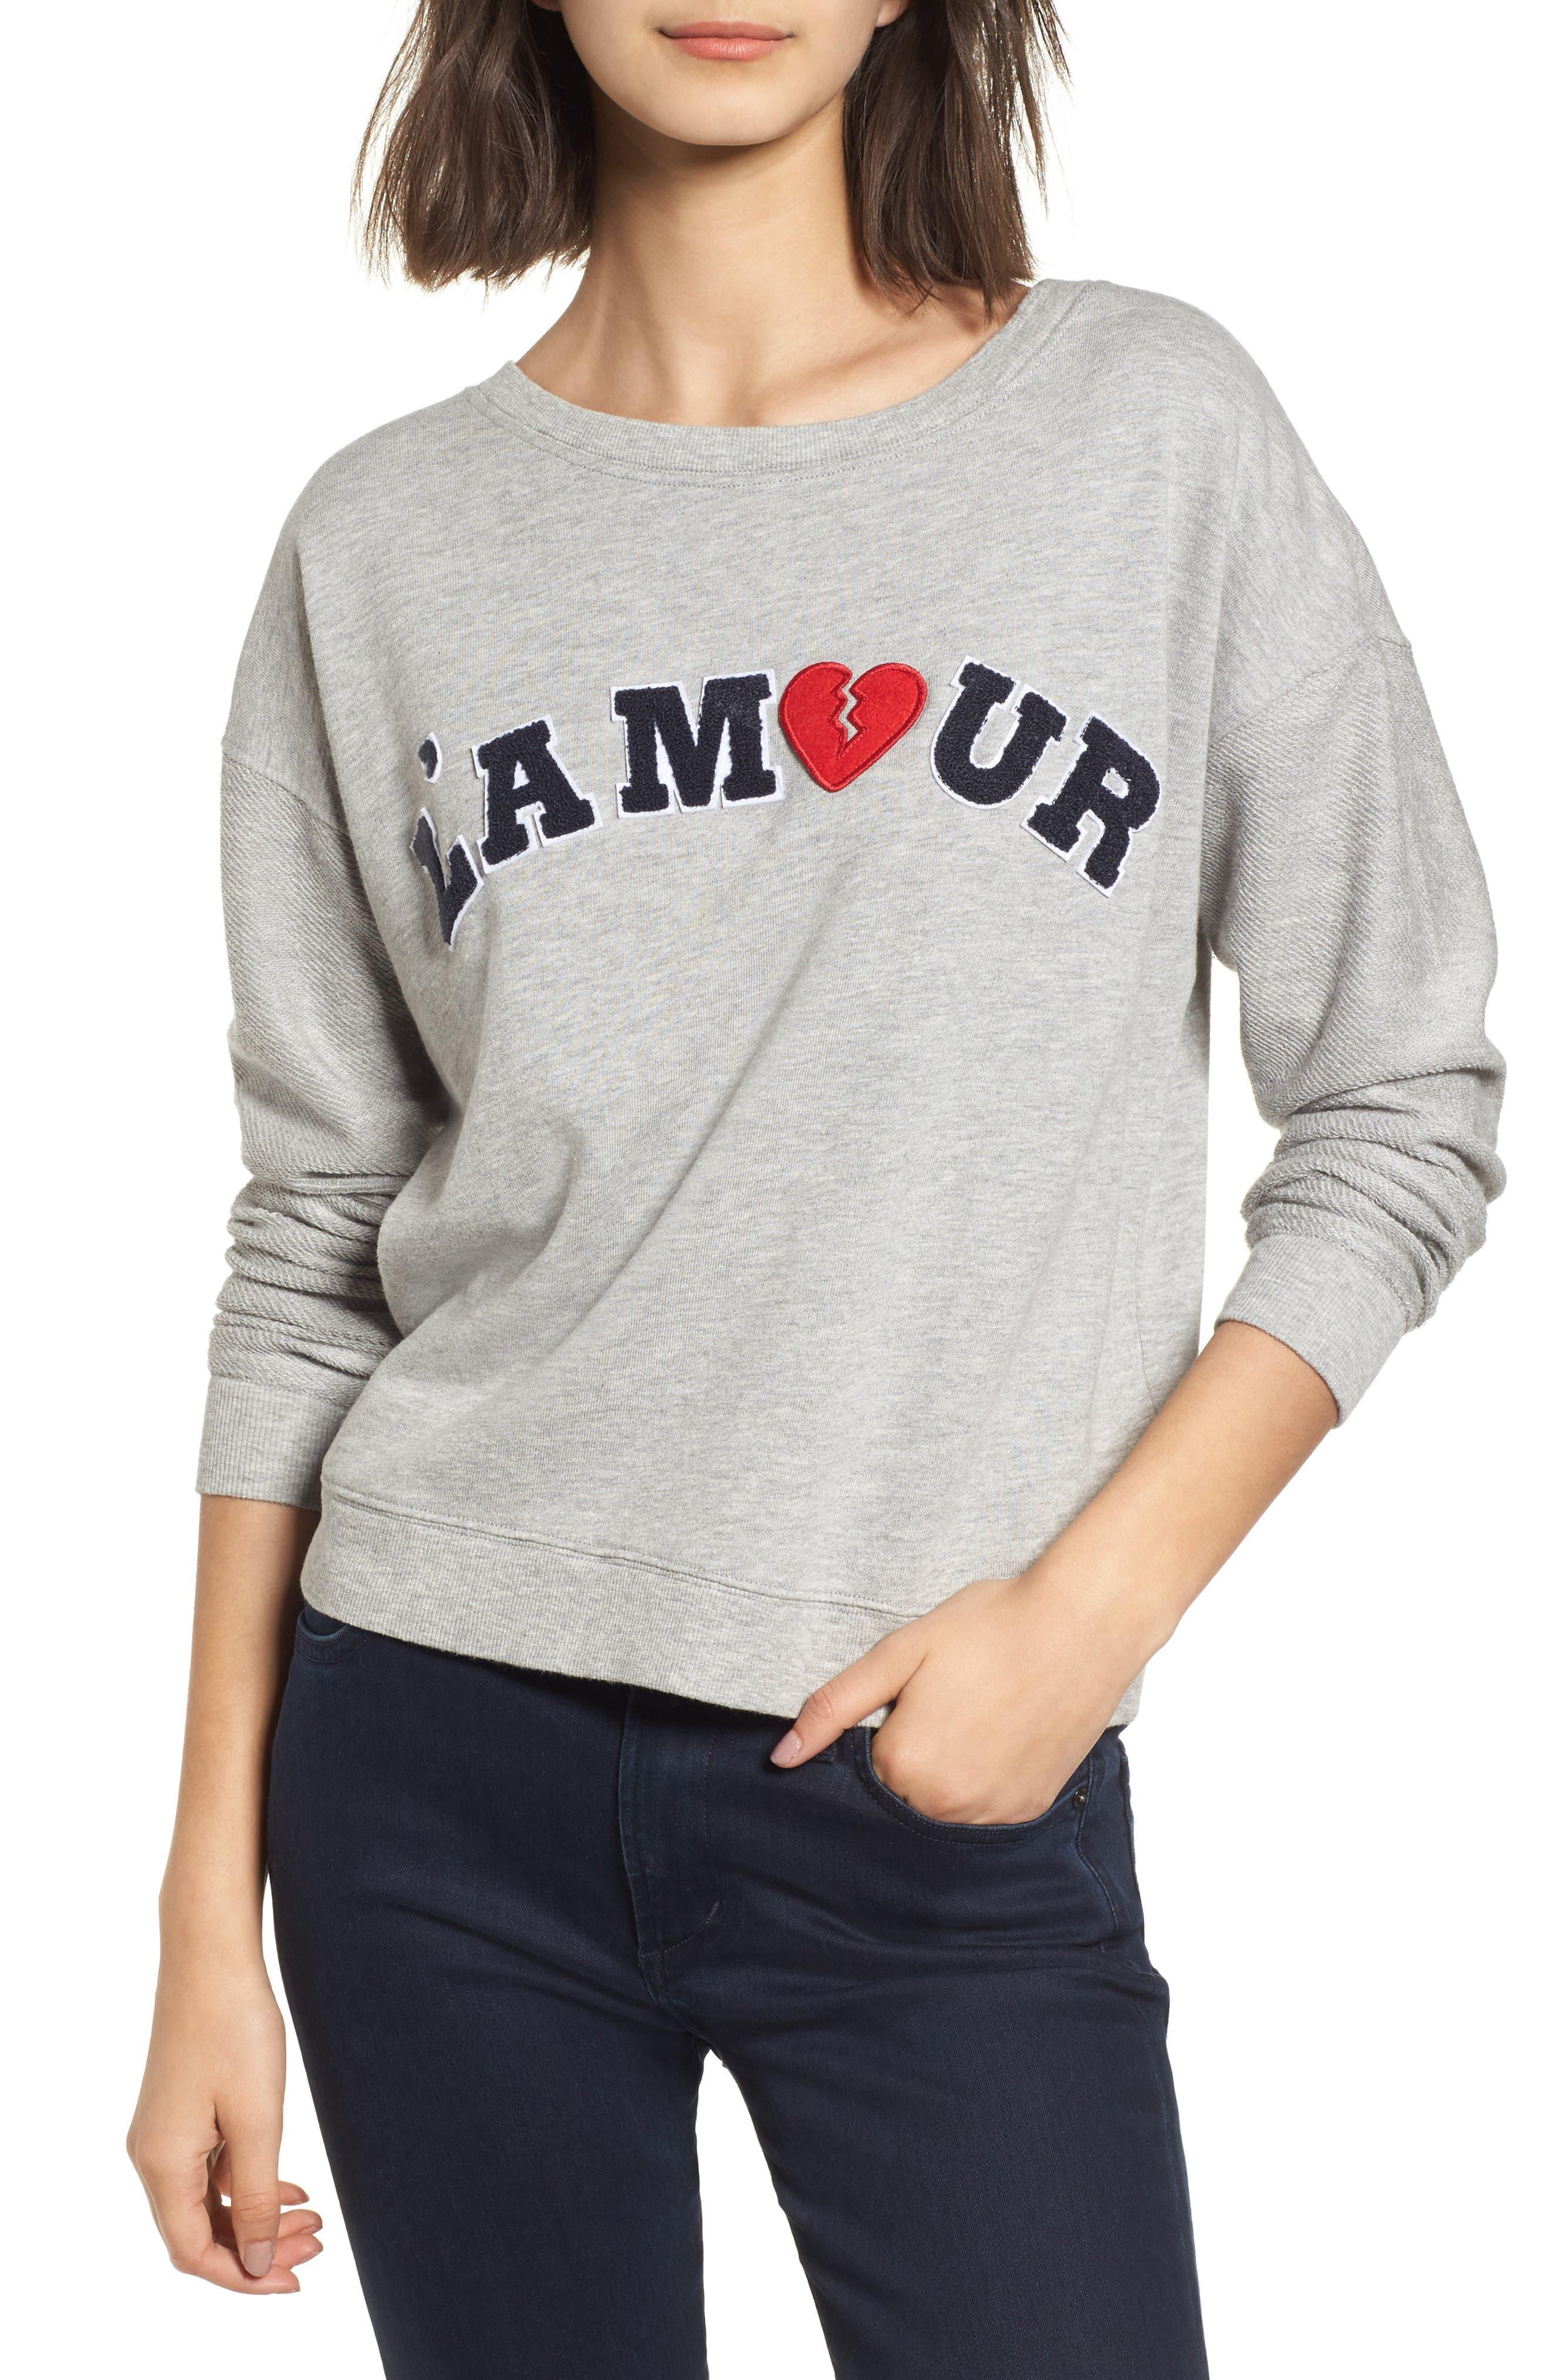 Kelli Paris Sweatshirt,                         Main,                         color, Lamour